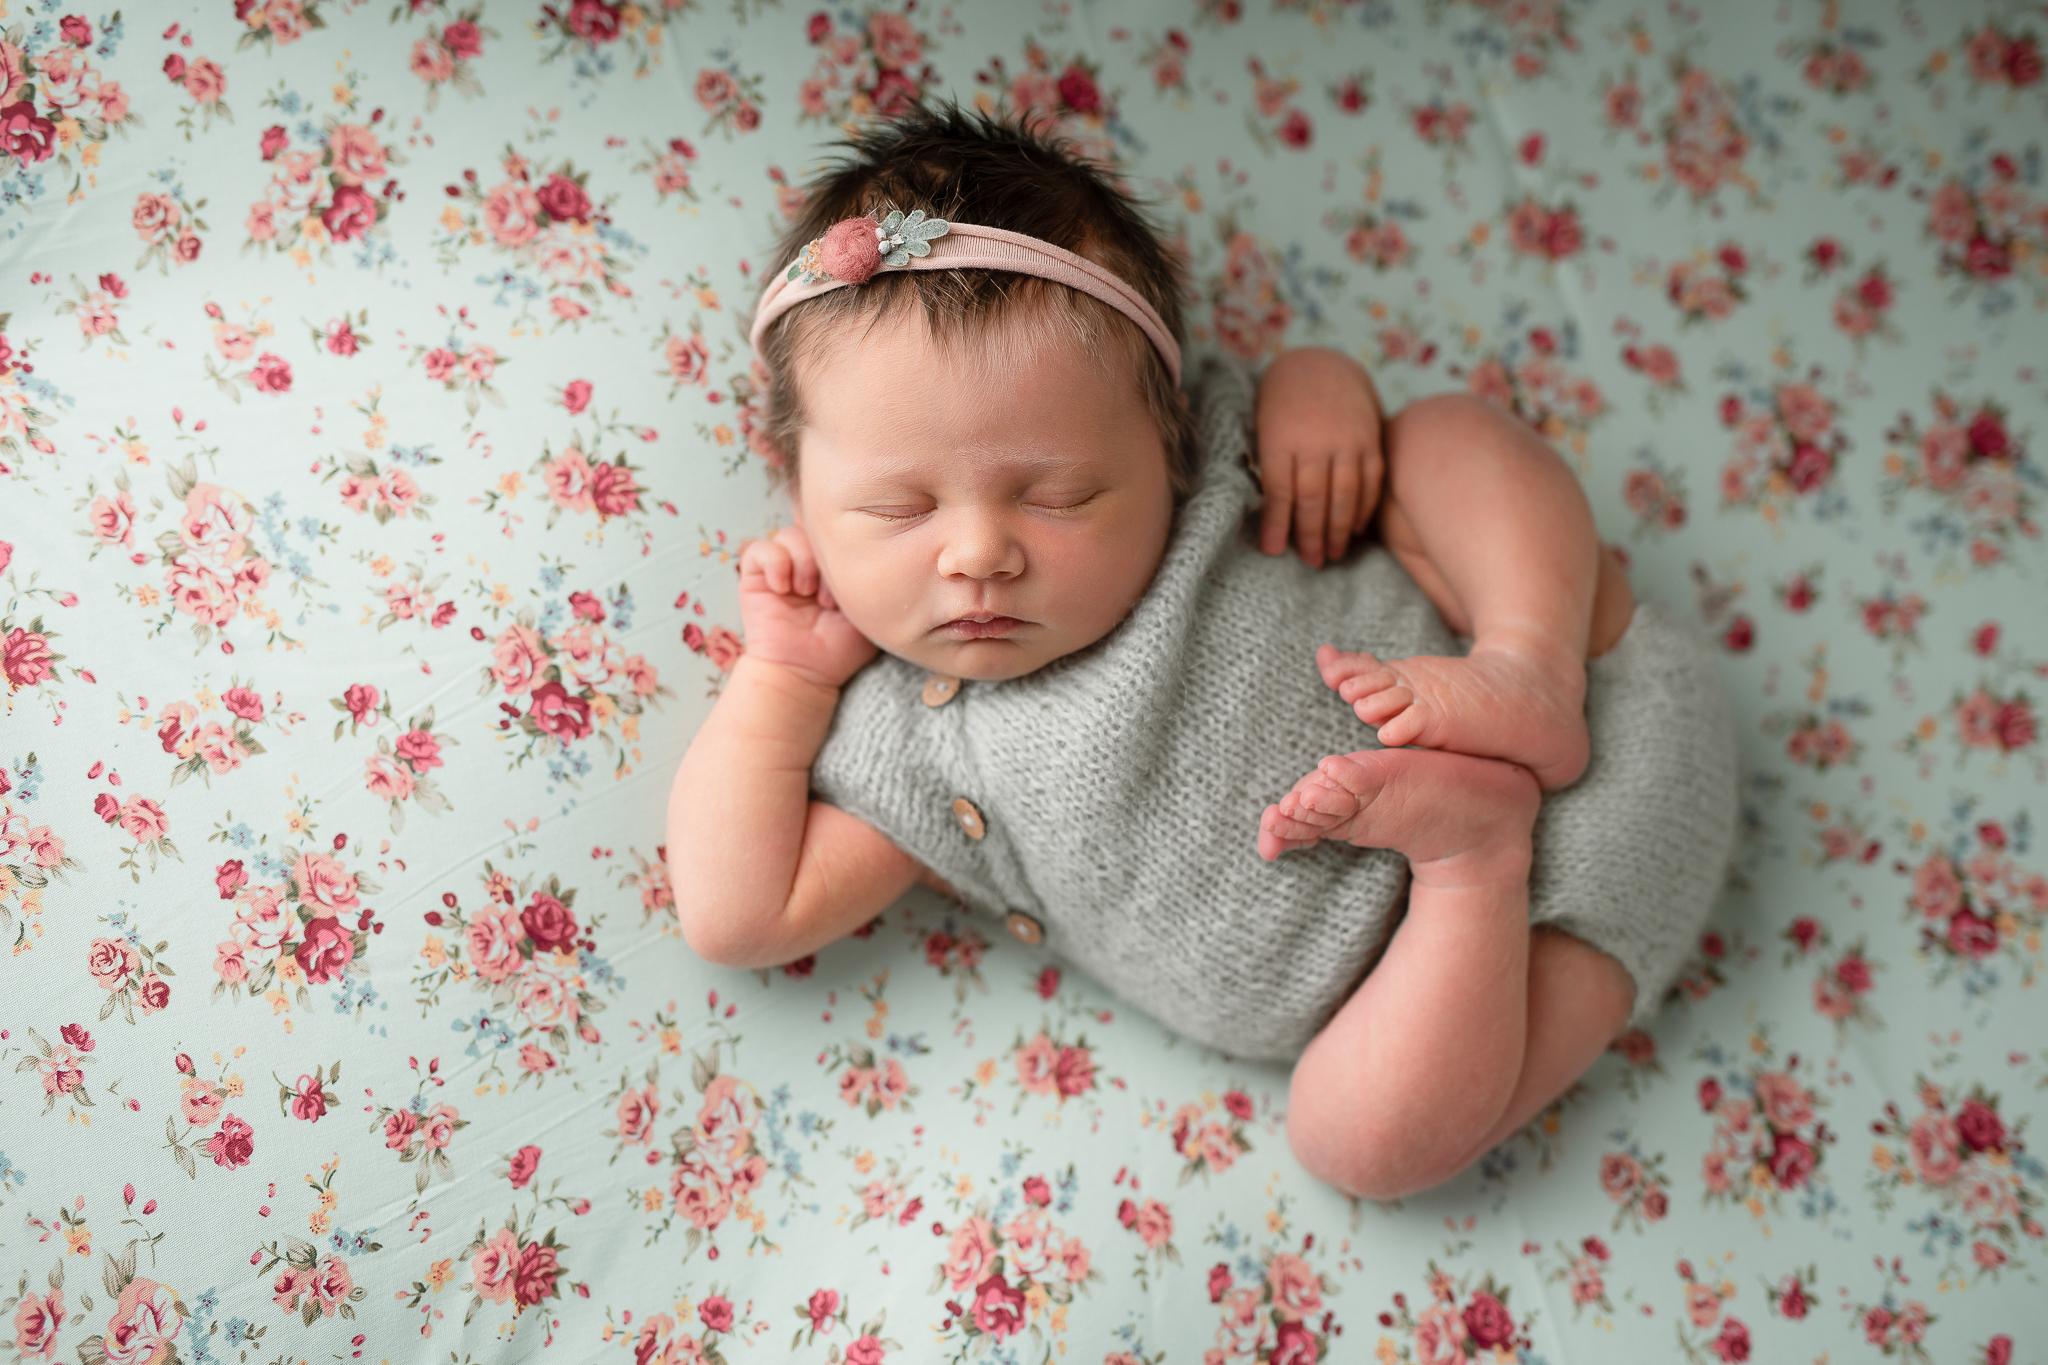 Newborn354NaomiLuciennePhotography062019-Edit.jpg